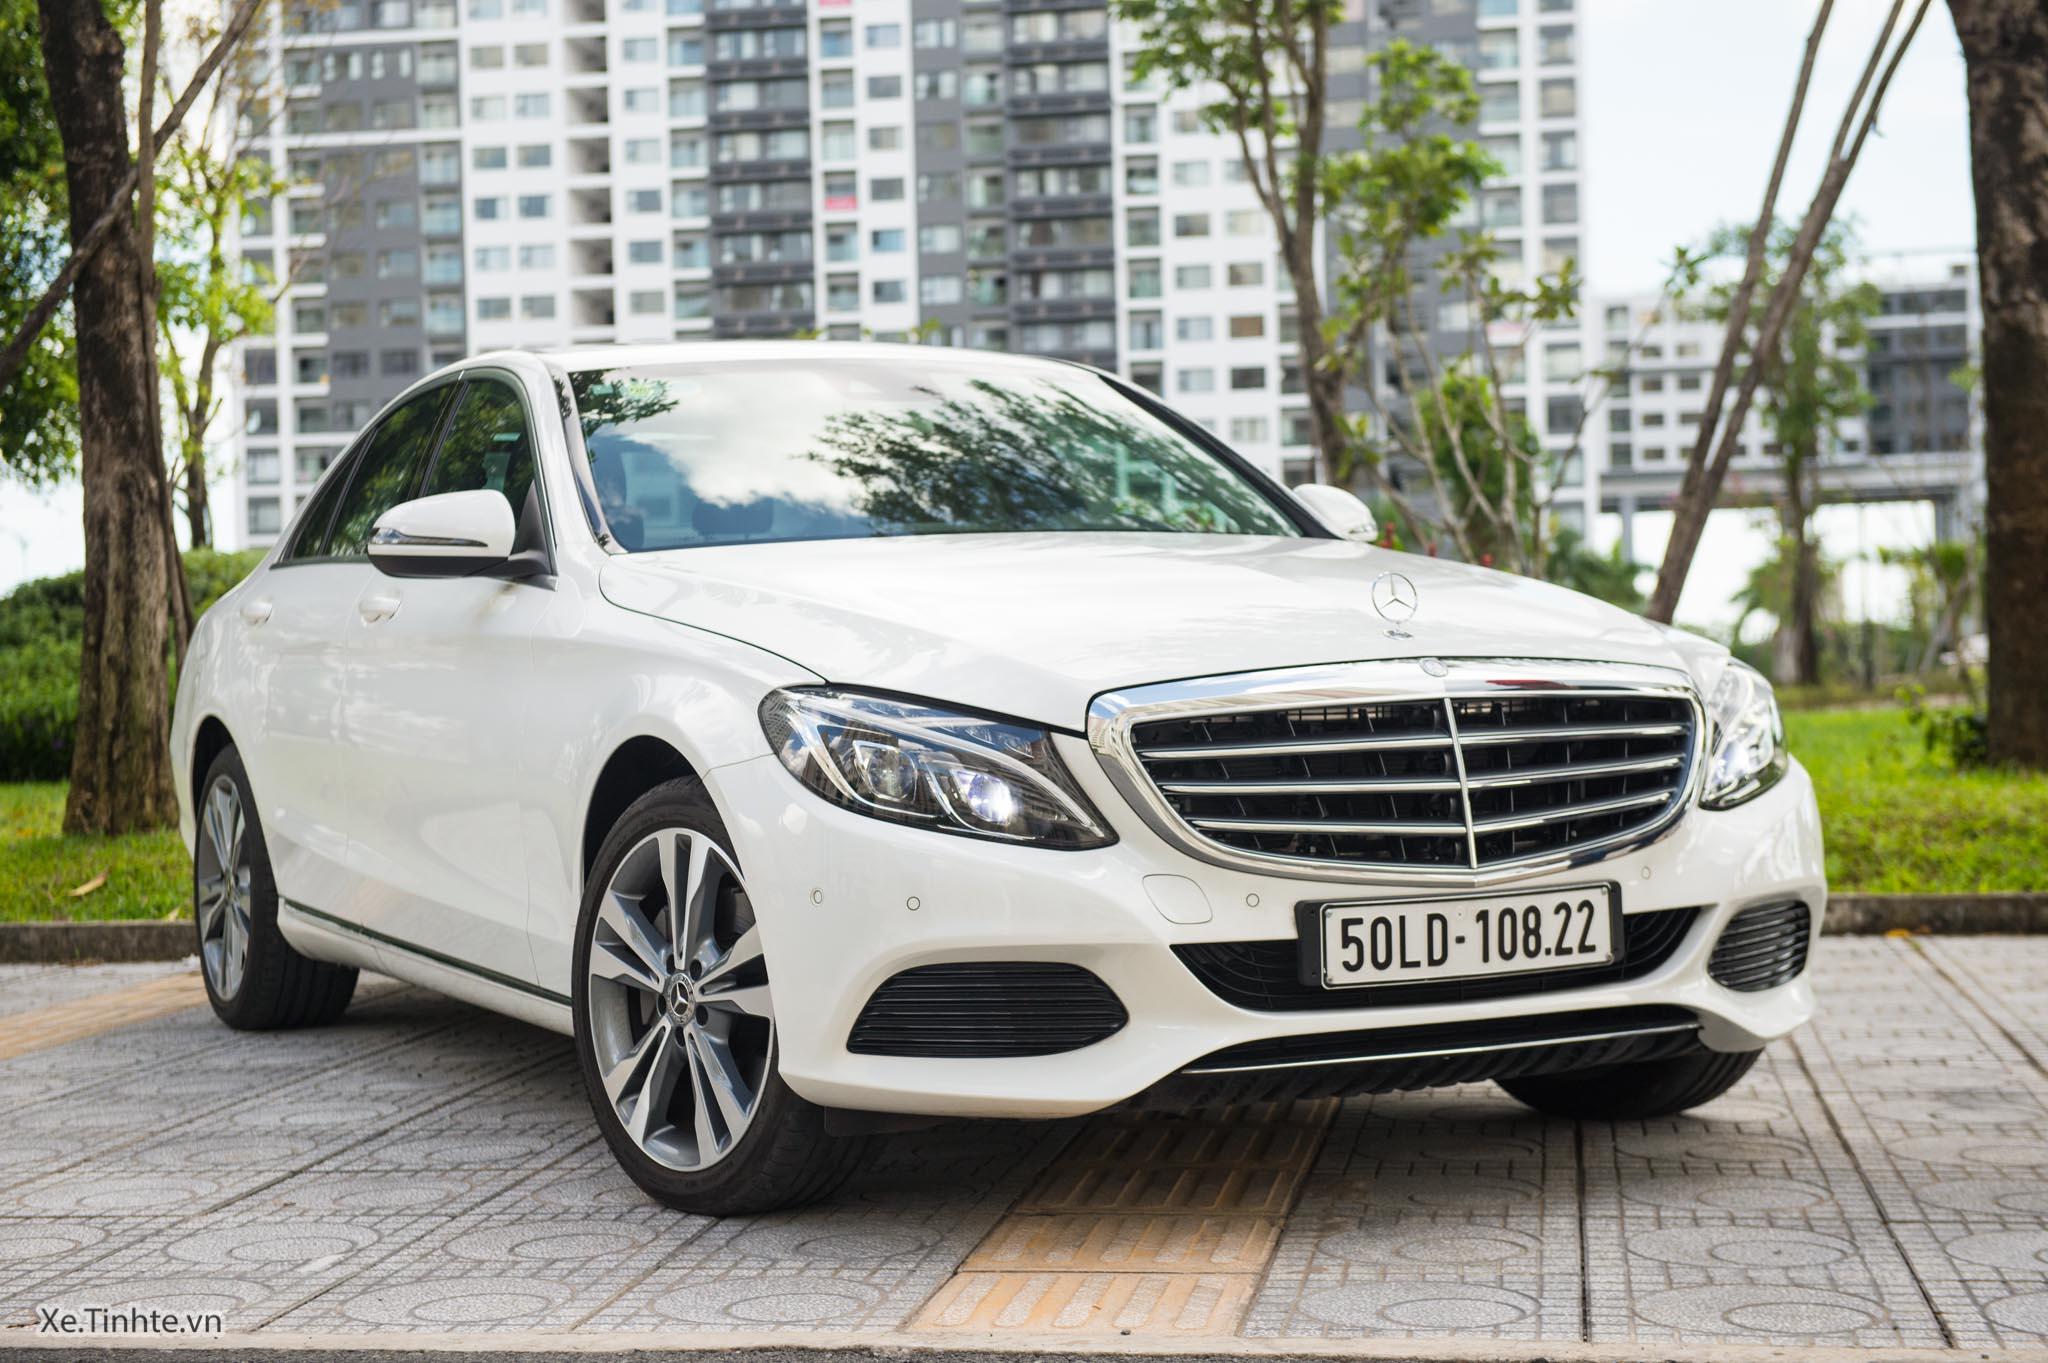 Mercedes_C250 Exclusive_Xe.tinhte.vn-7579.jpg